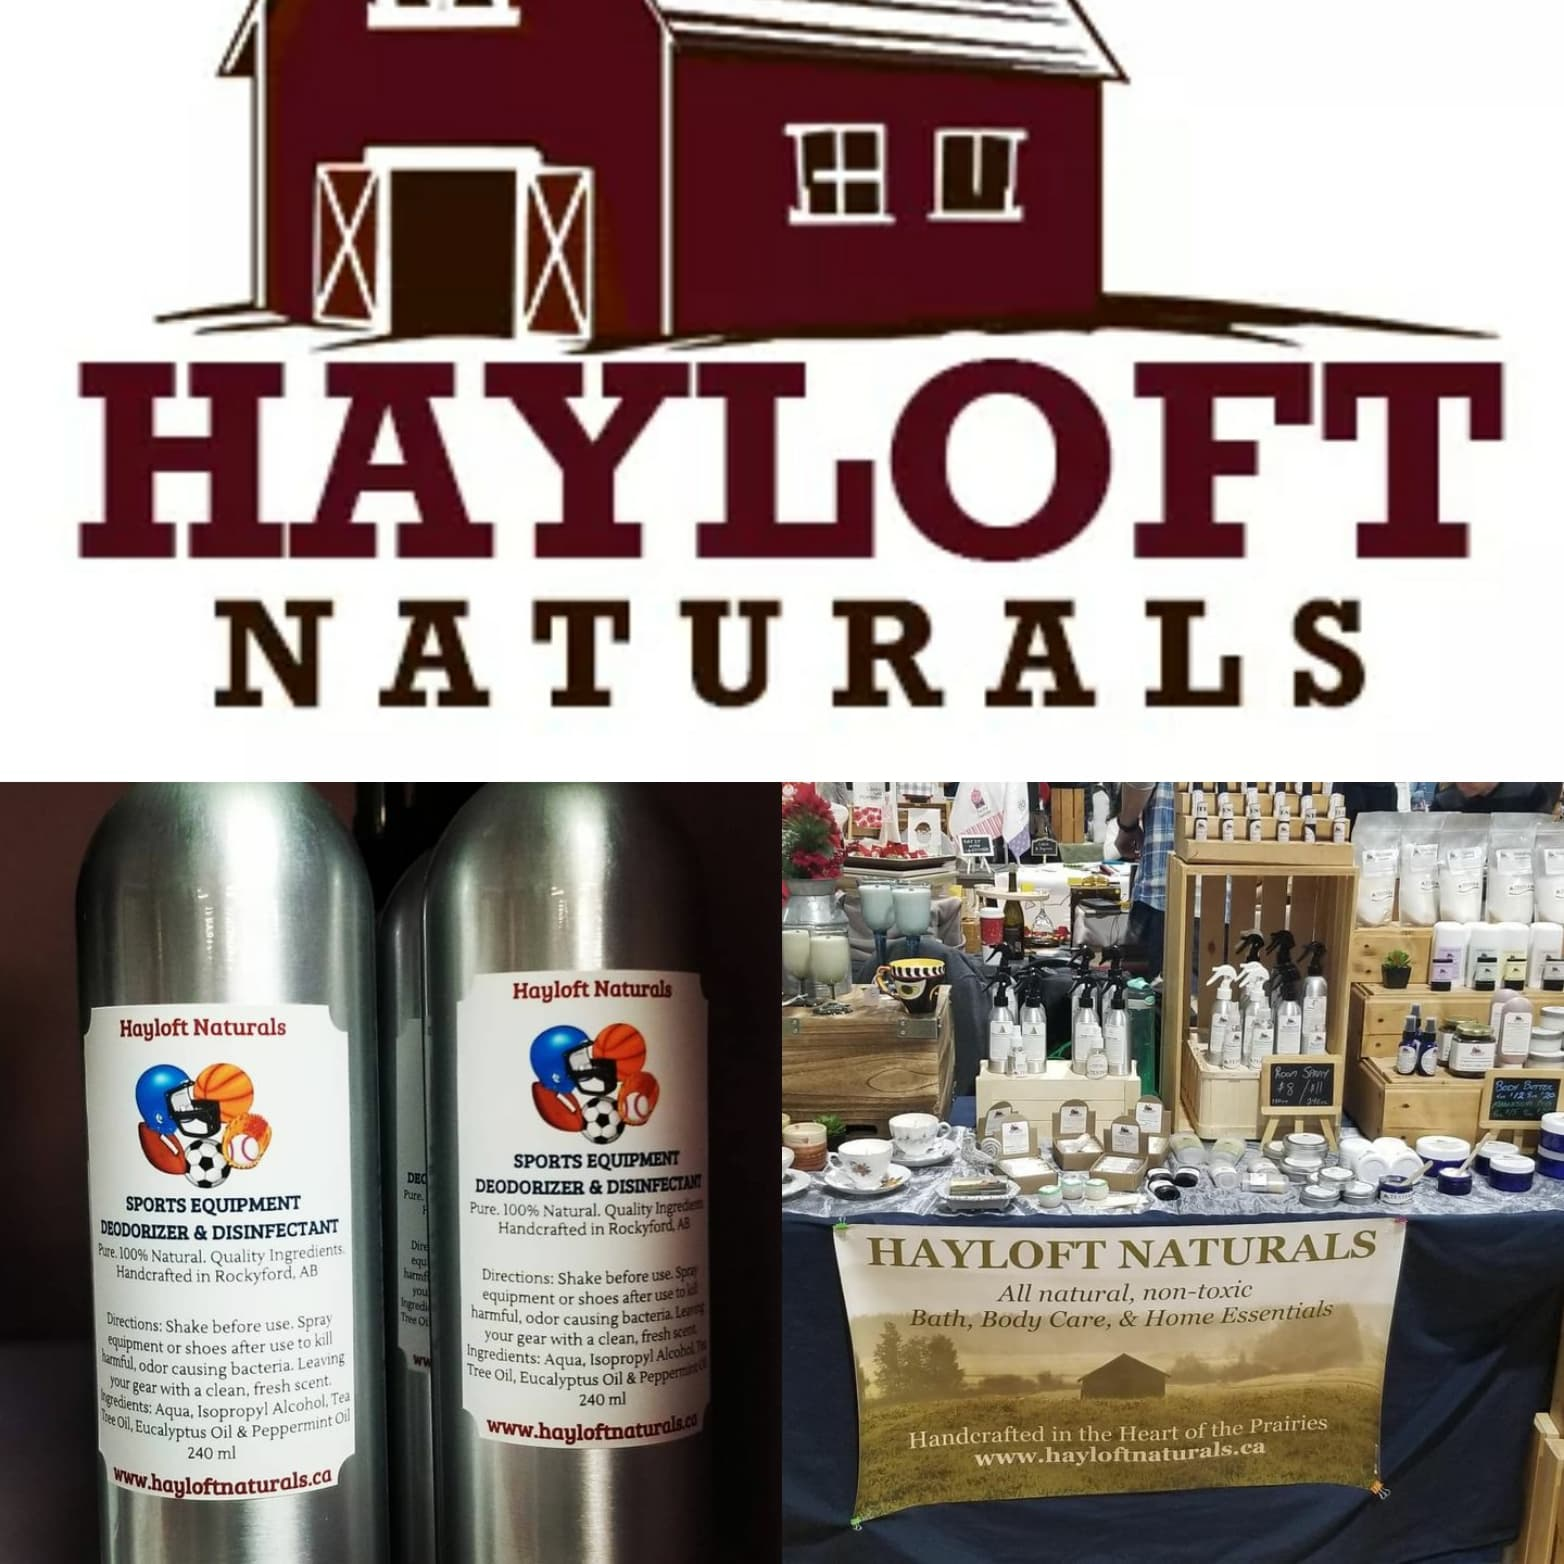 Hayloft Naturals